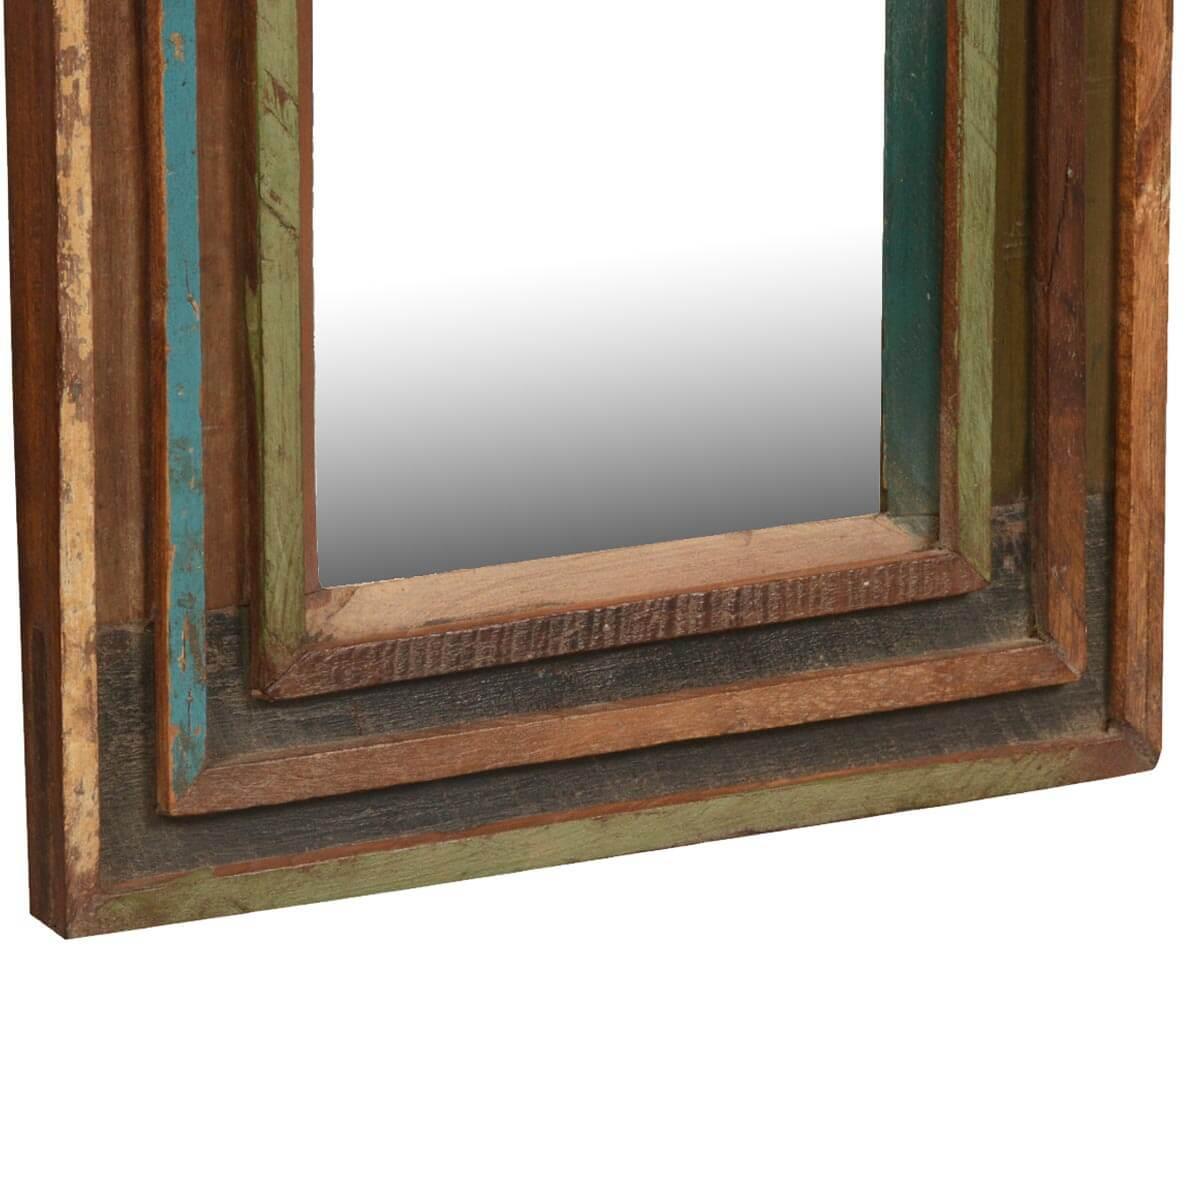 "Appalachian Rustic Reclaimed Wood 12.5"" Square Framed Wall ..."